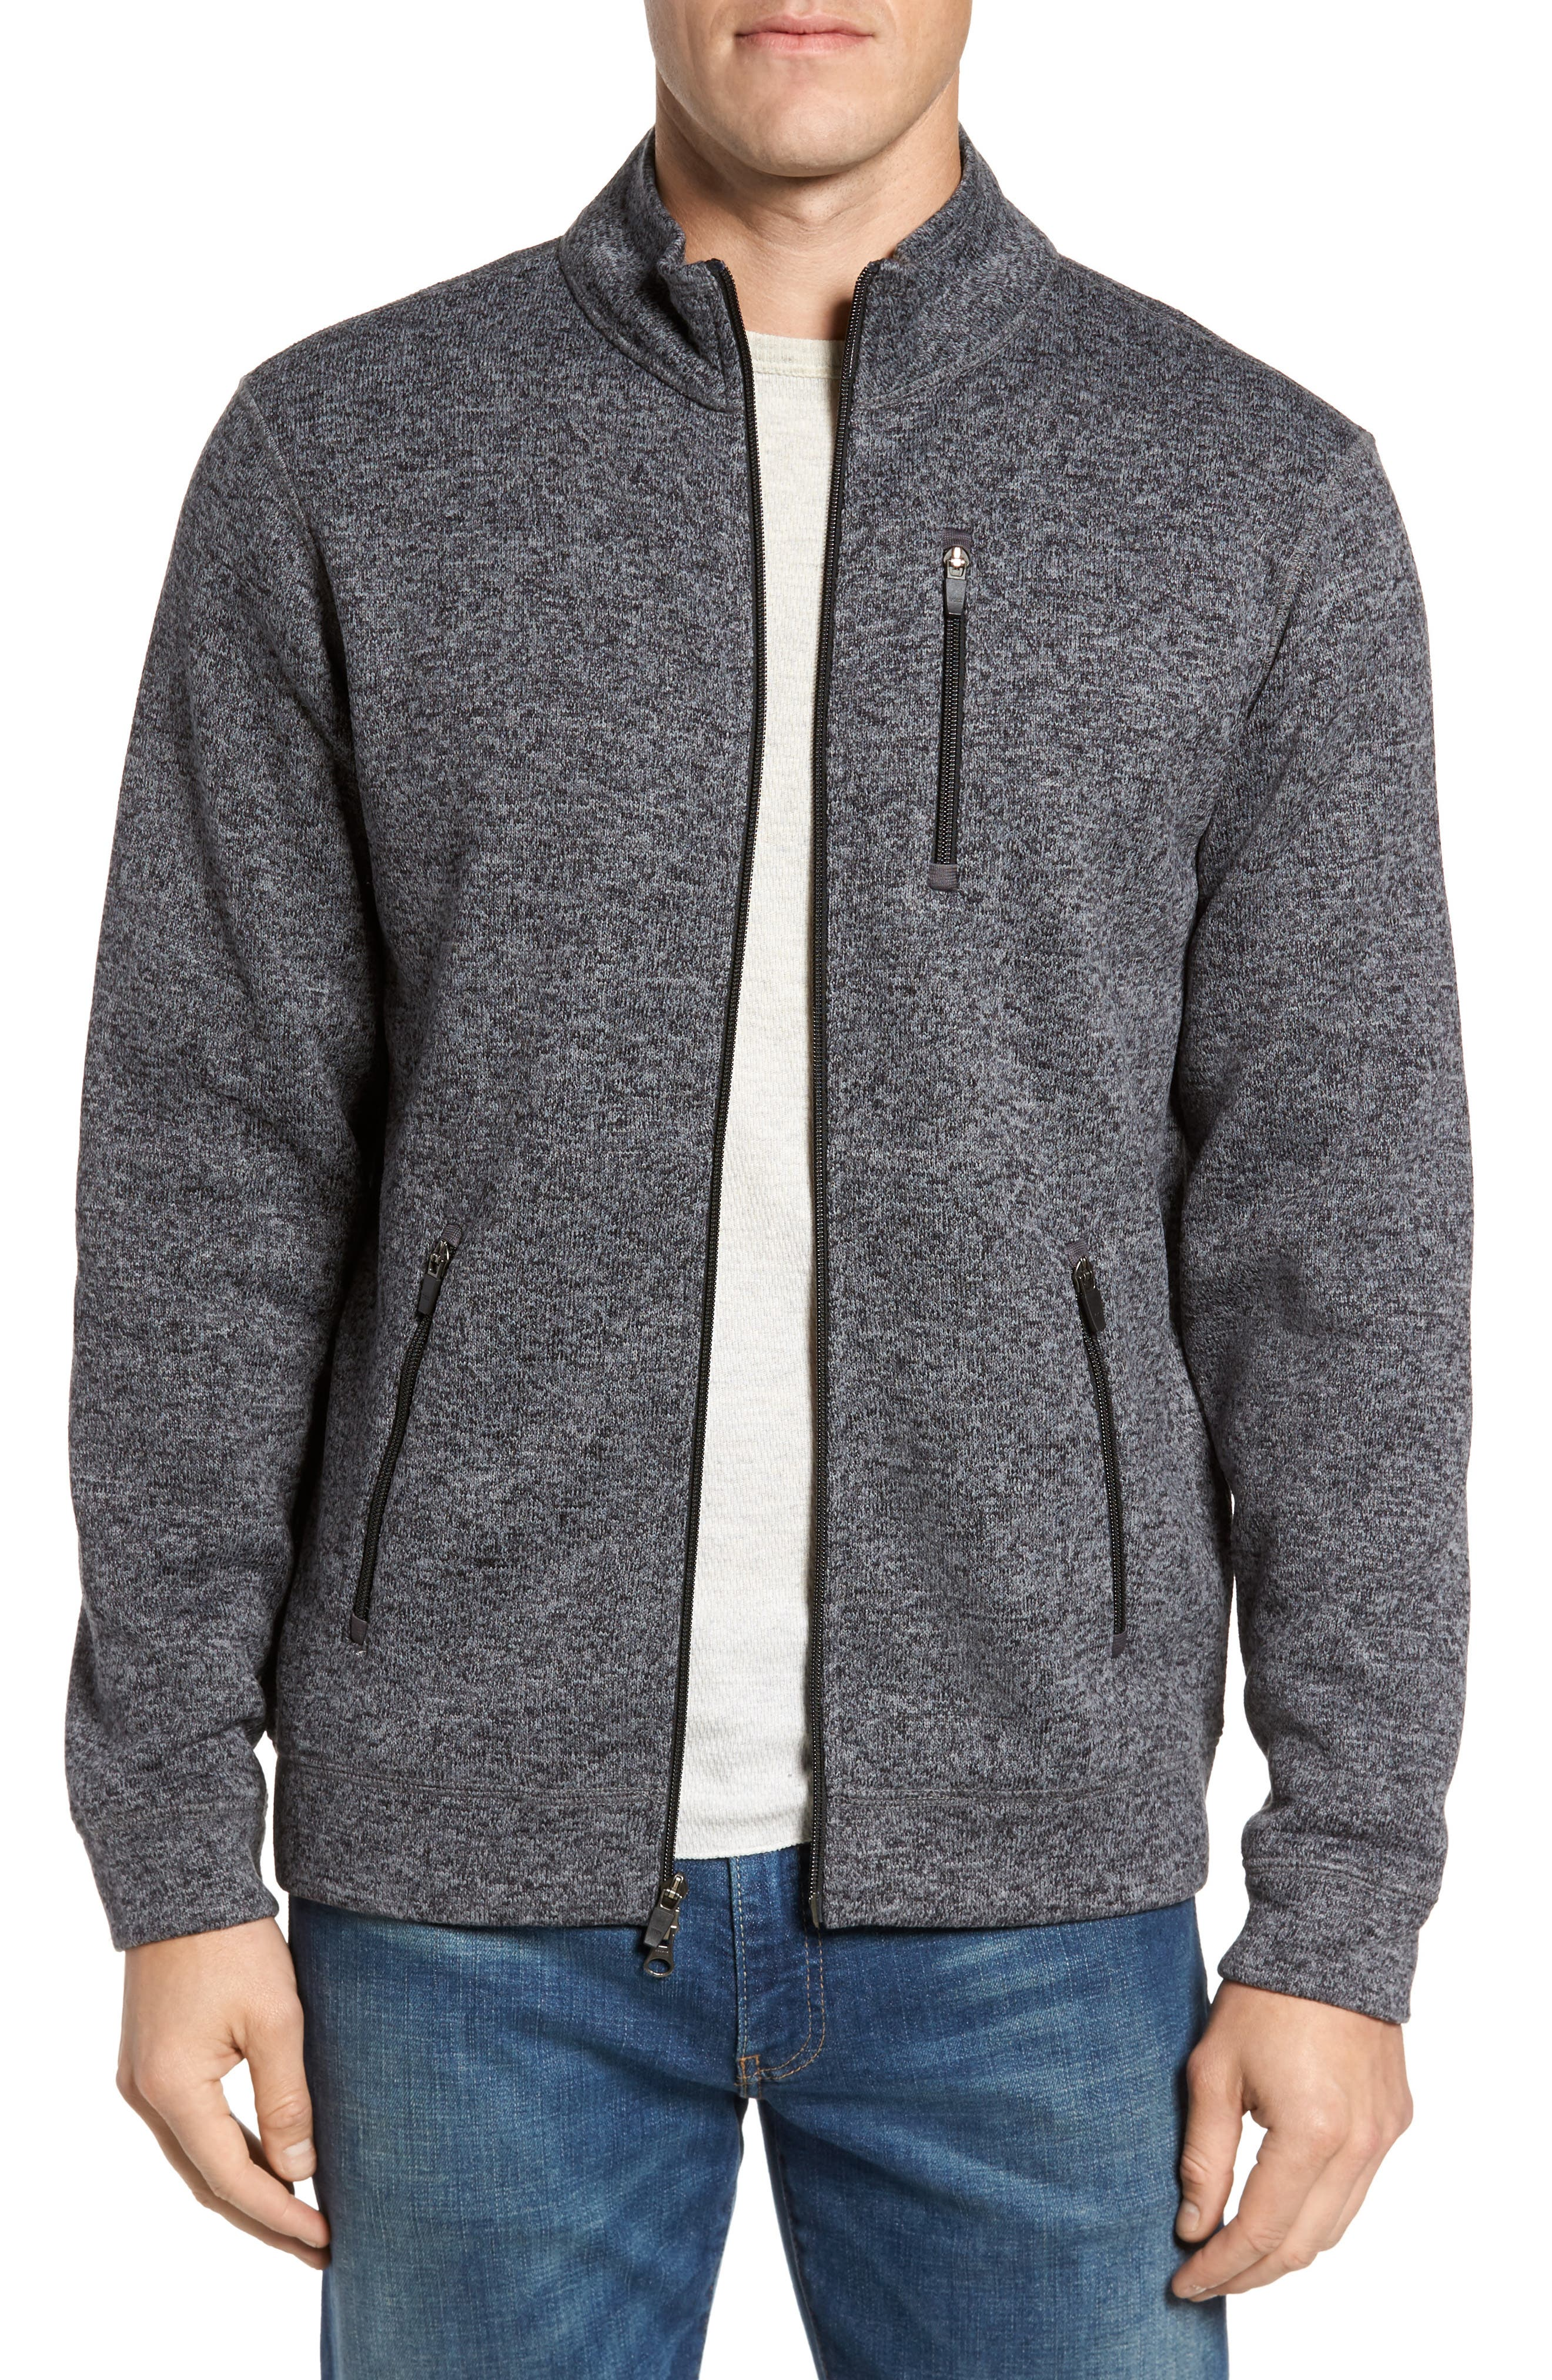 Sweater Knit Fleece Zip Front Jacket,                             Main thumbnail 1, color,